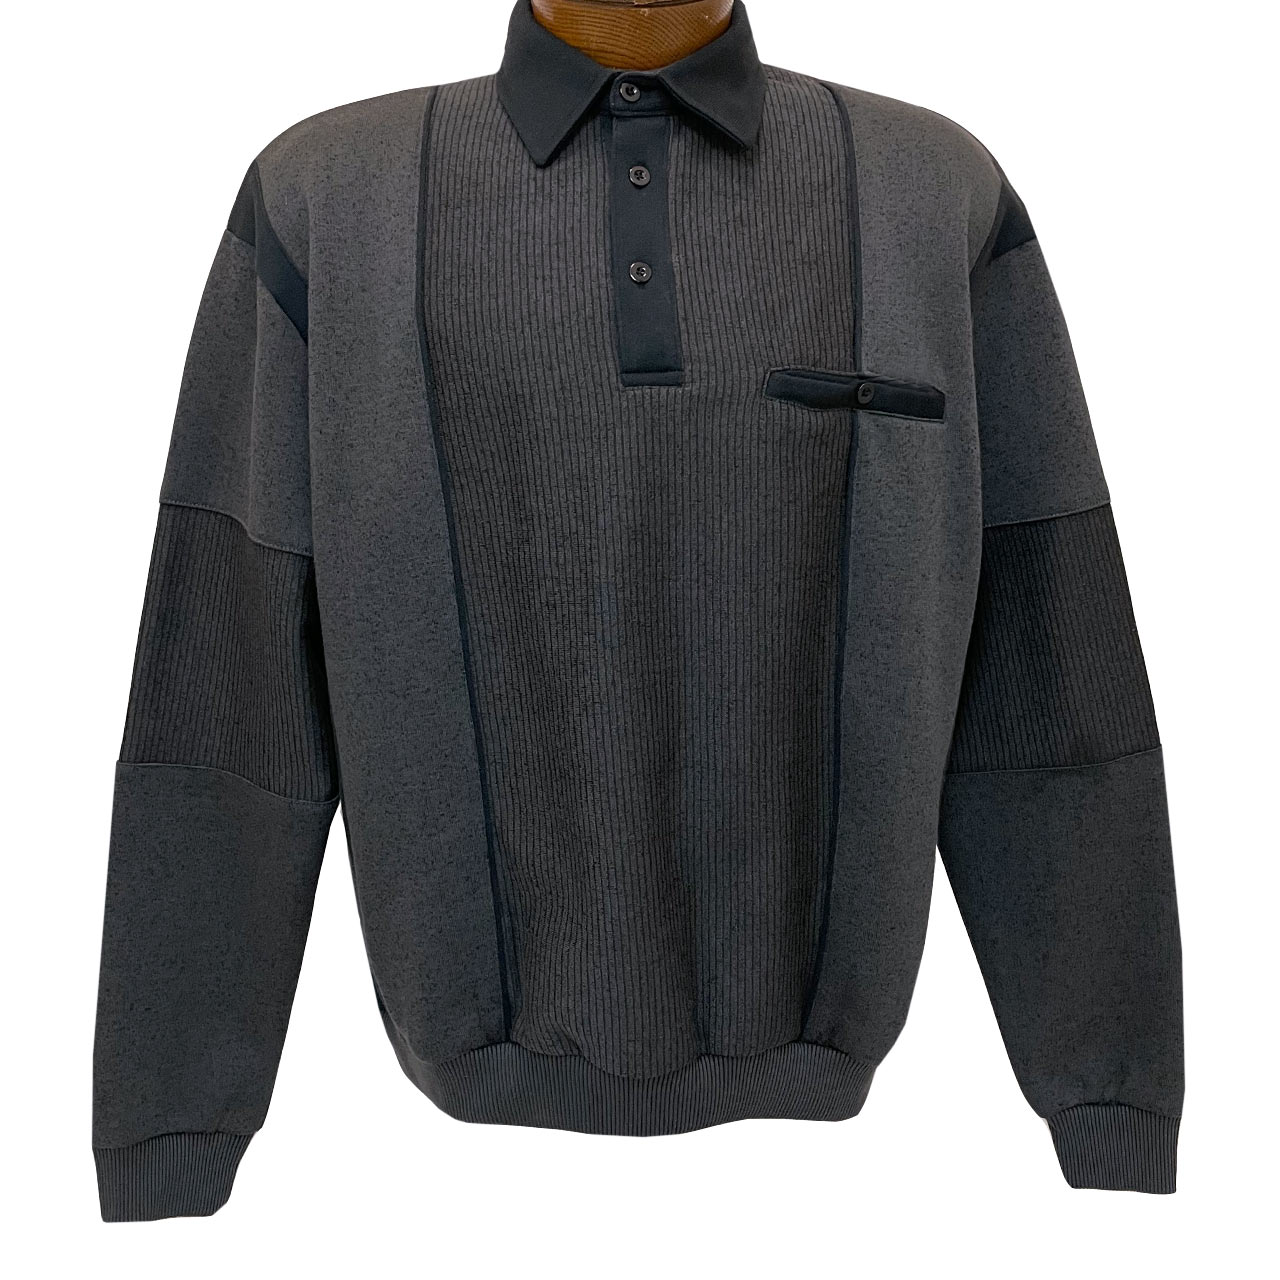 Men's Classics By Palmland Long Sleeve Vertical Fleece Pieced Banded Bottom Shirt 6094-165B Charcoal